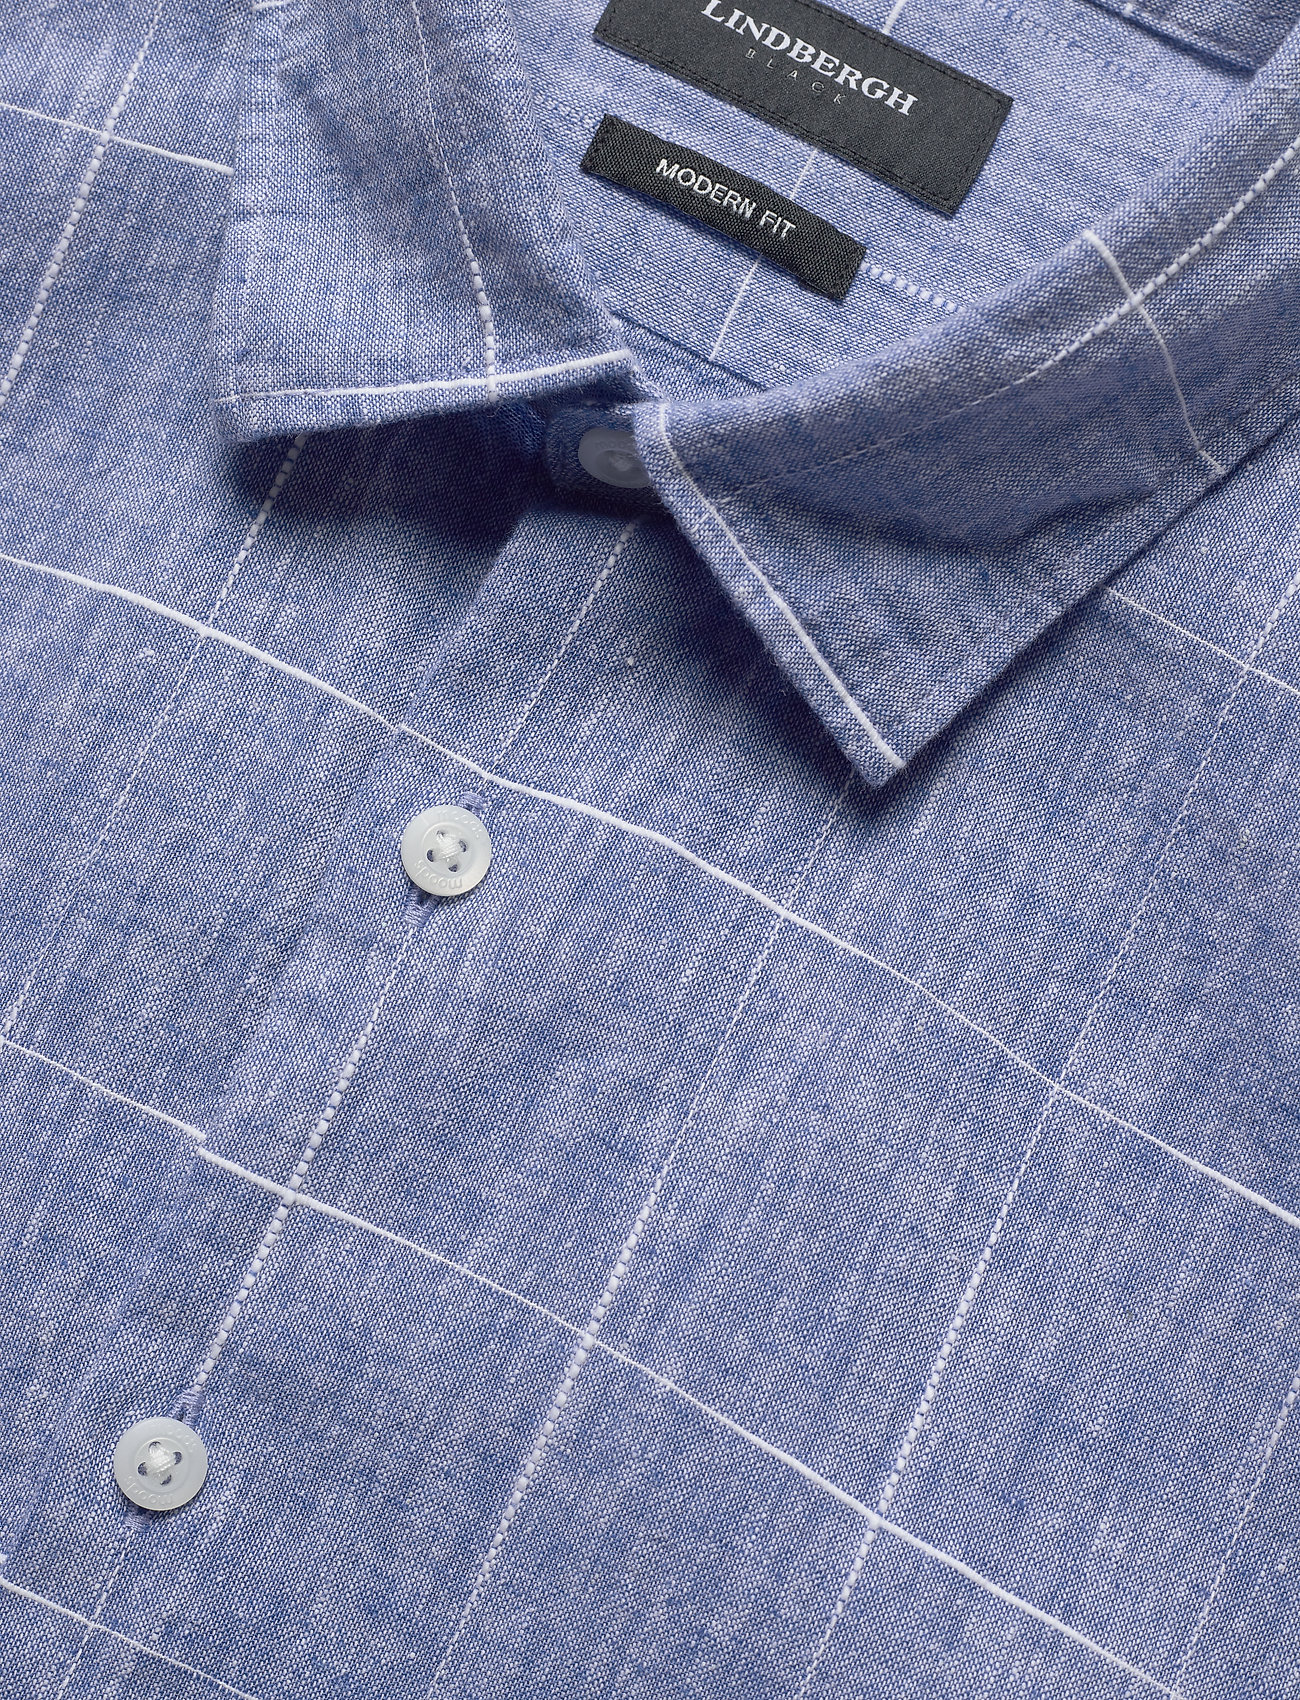 Lindbergh Checked Structure Shirt S/s - Skjortor Light Blue